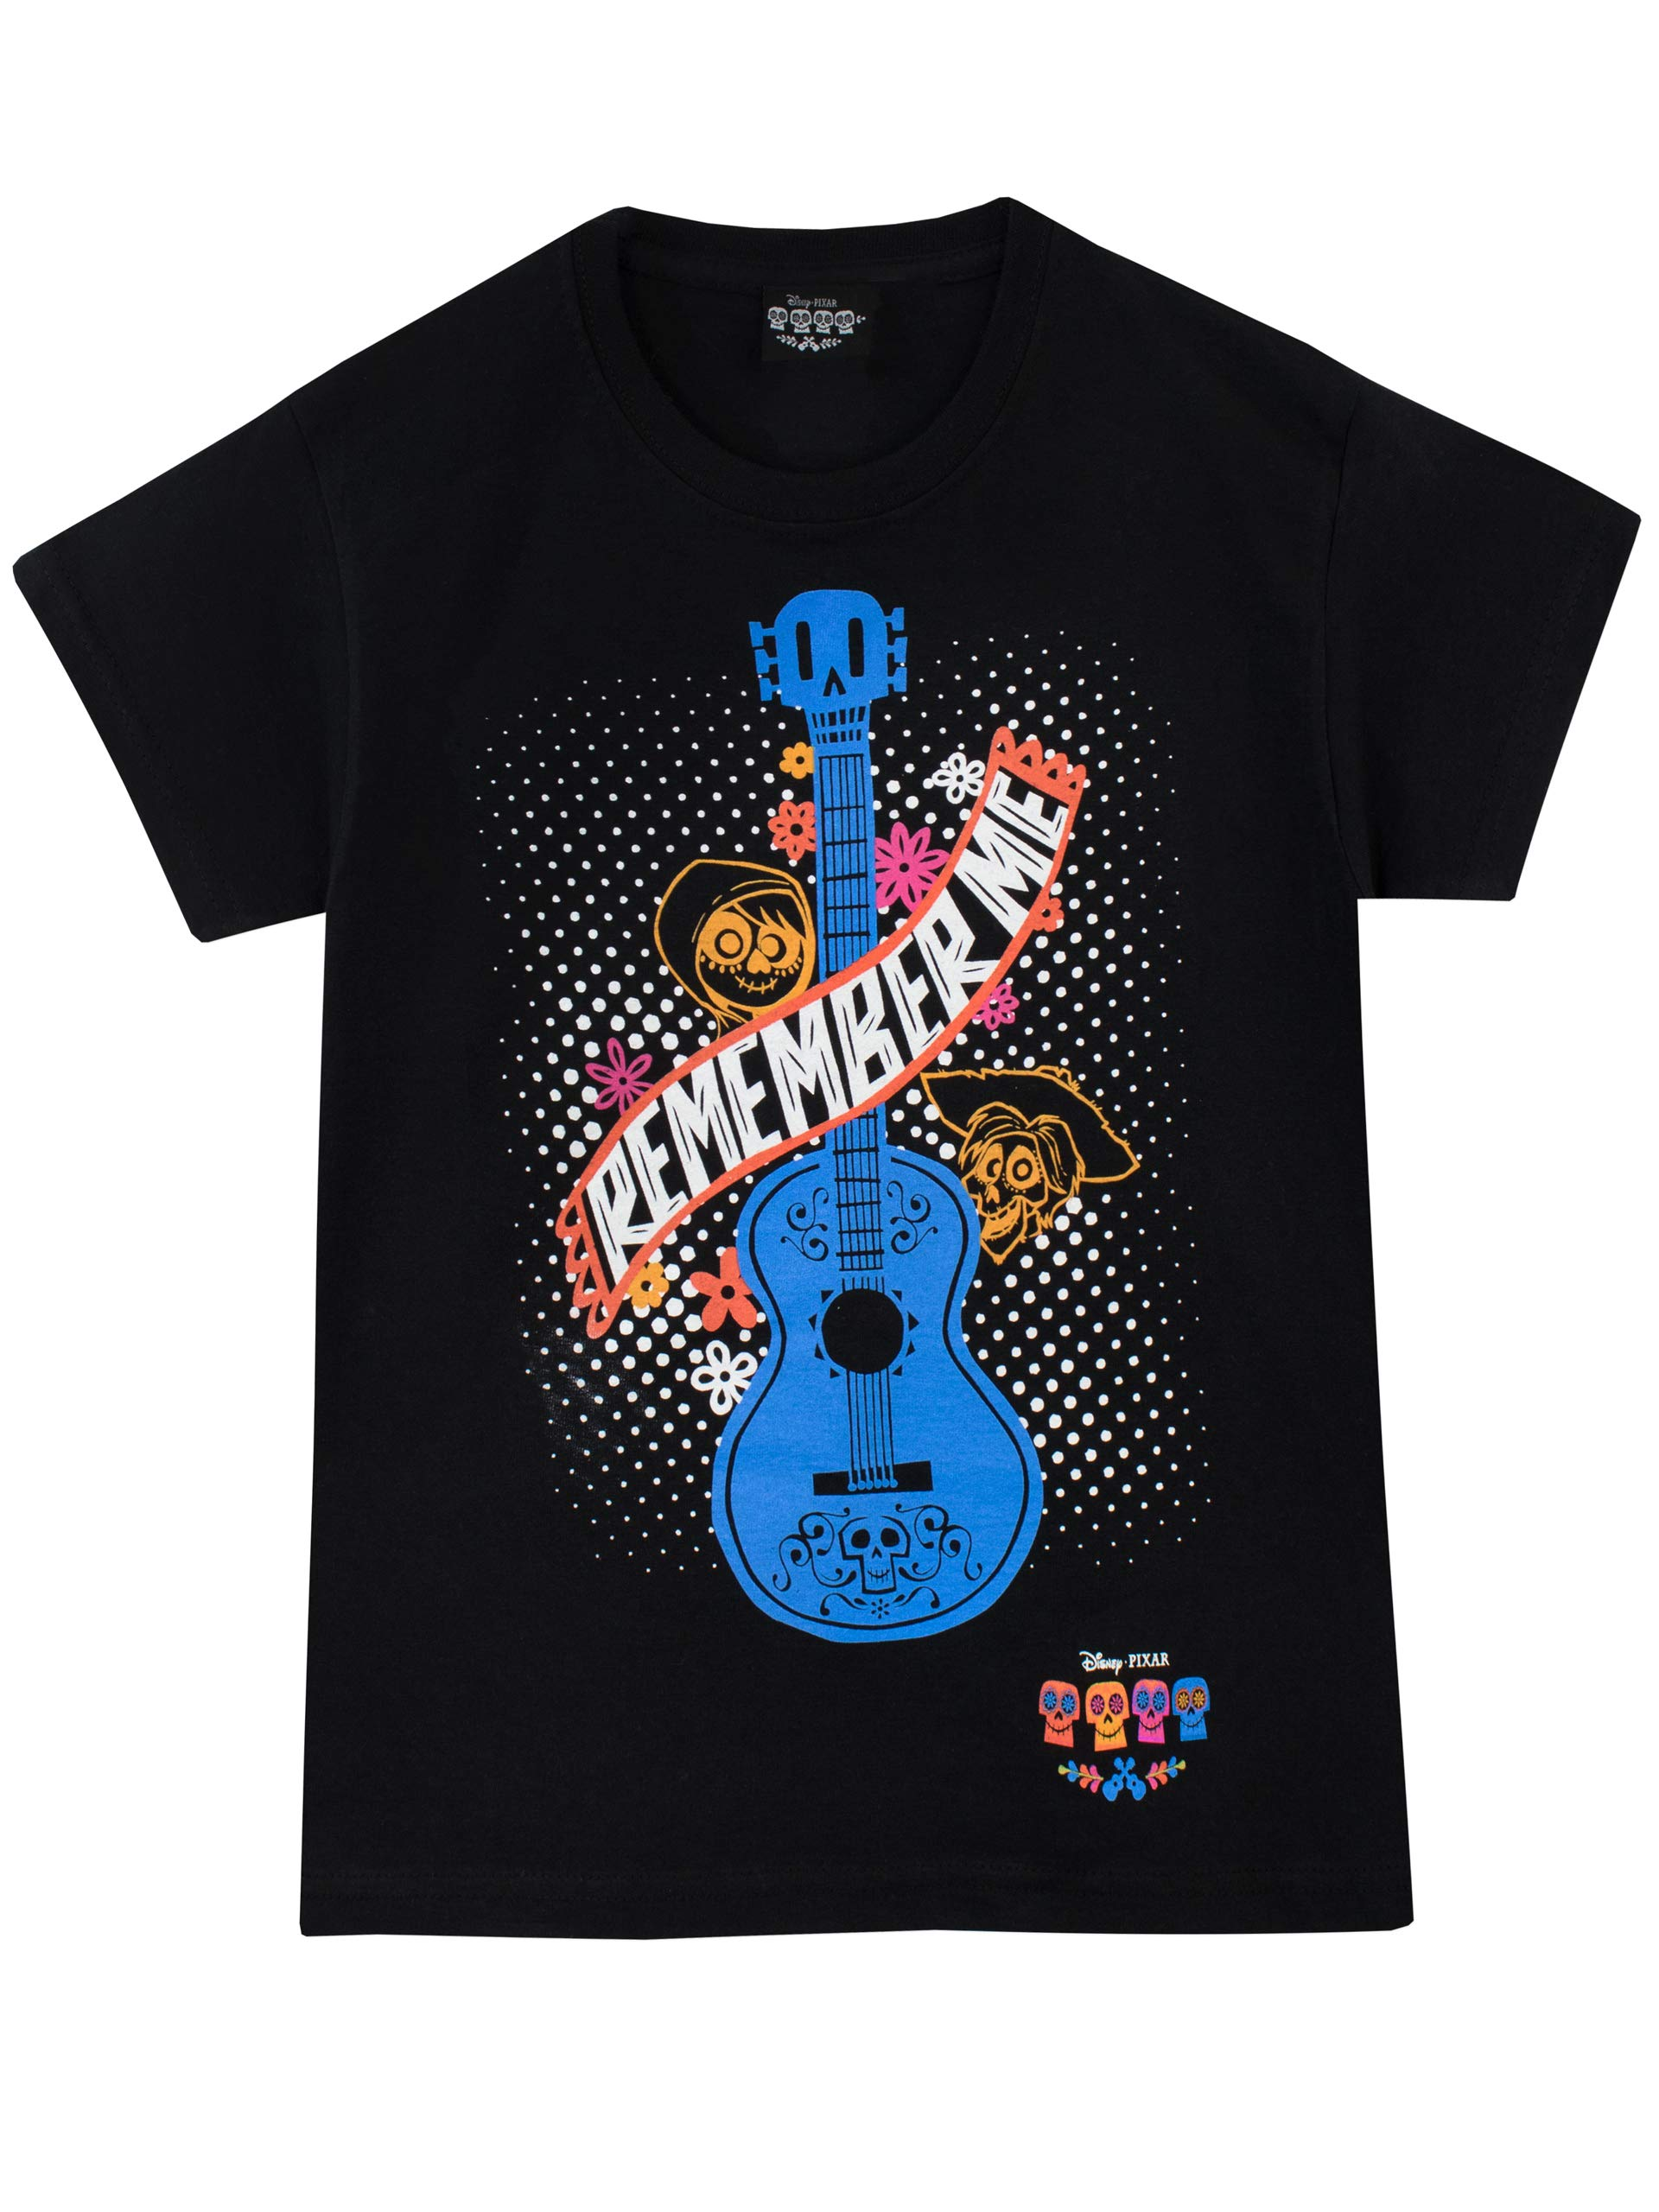 9fa4f057f6 Disney Camiseta de Manga Corta para niños Coco - De Disney